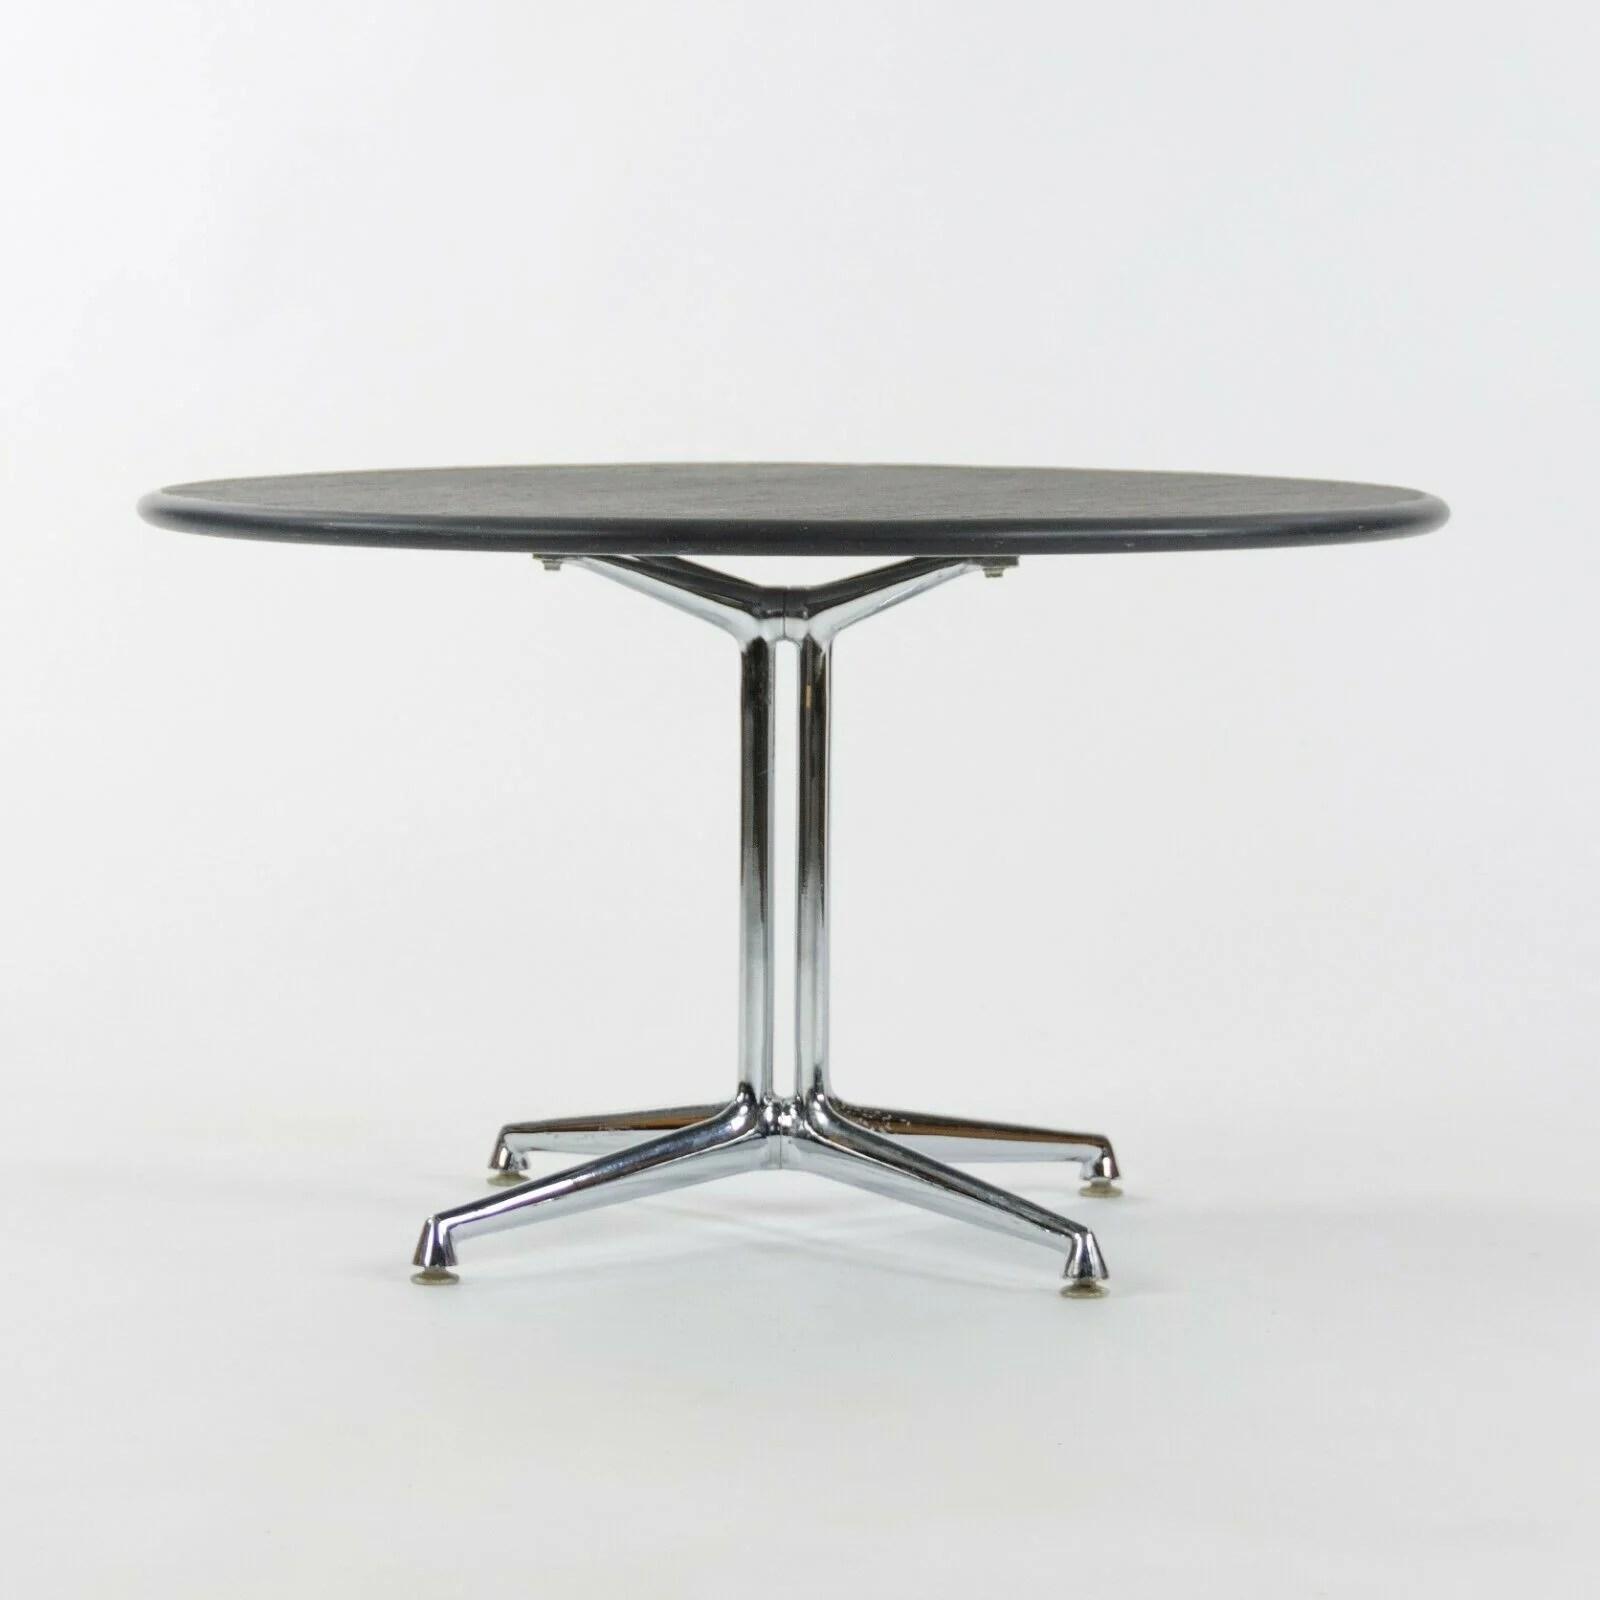 1970s herman miller eames girard la fonda end coffee table w round slate top